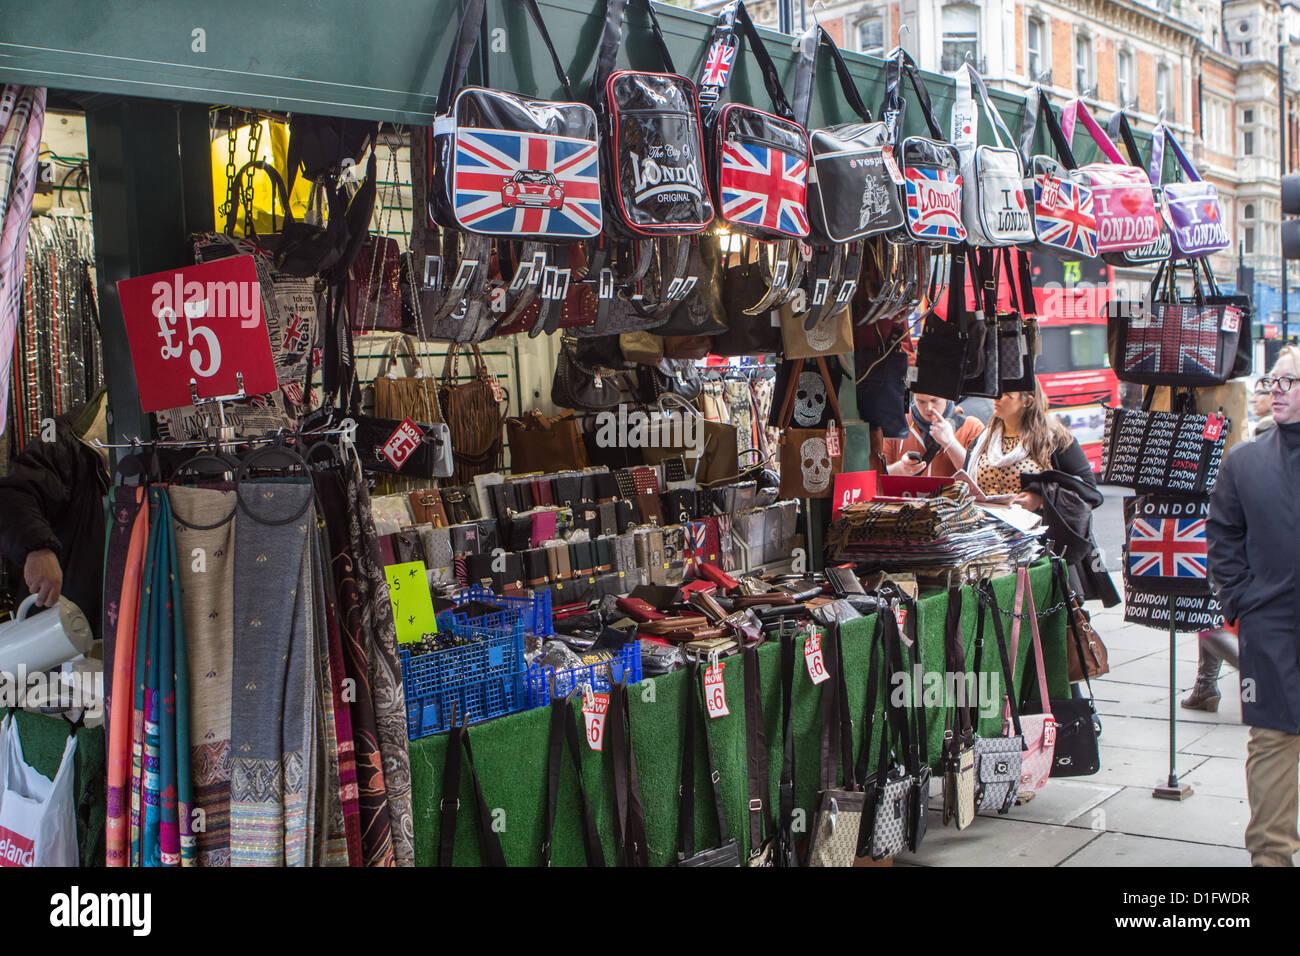 Oxford Street souvenir stall - Stock Image